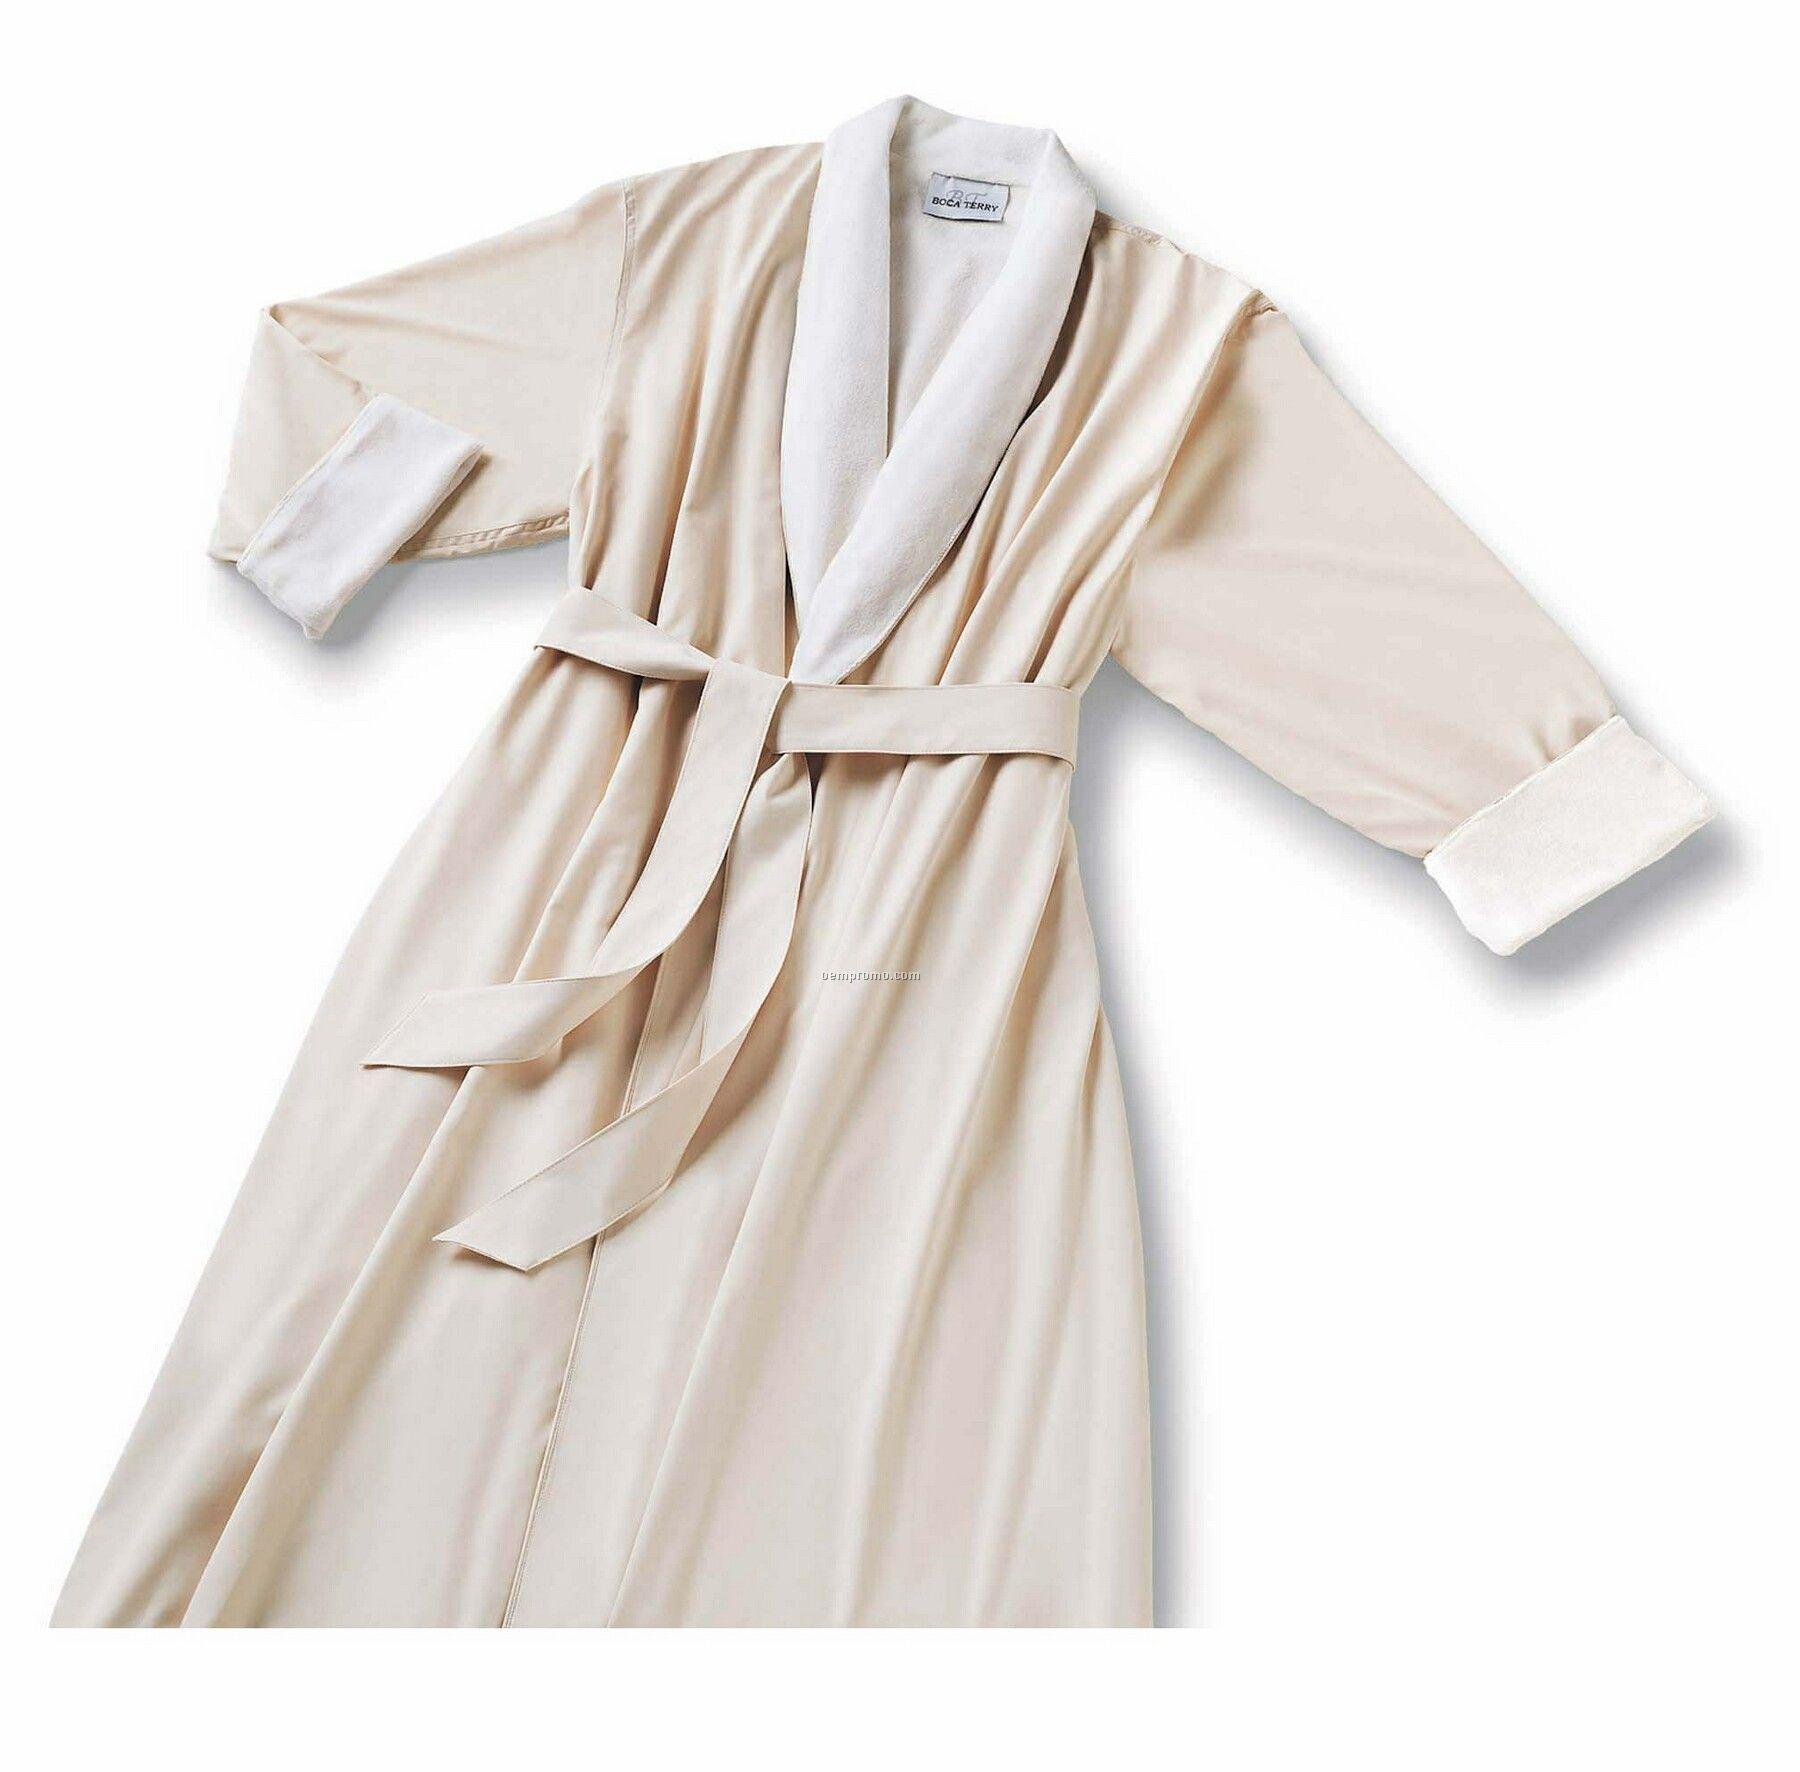 Shawl Collar Microfiber Robe W/ Cotton Poly Knit Lining